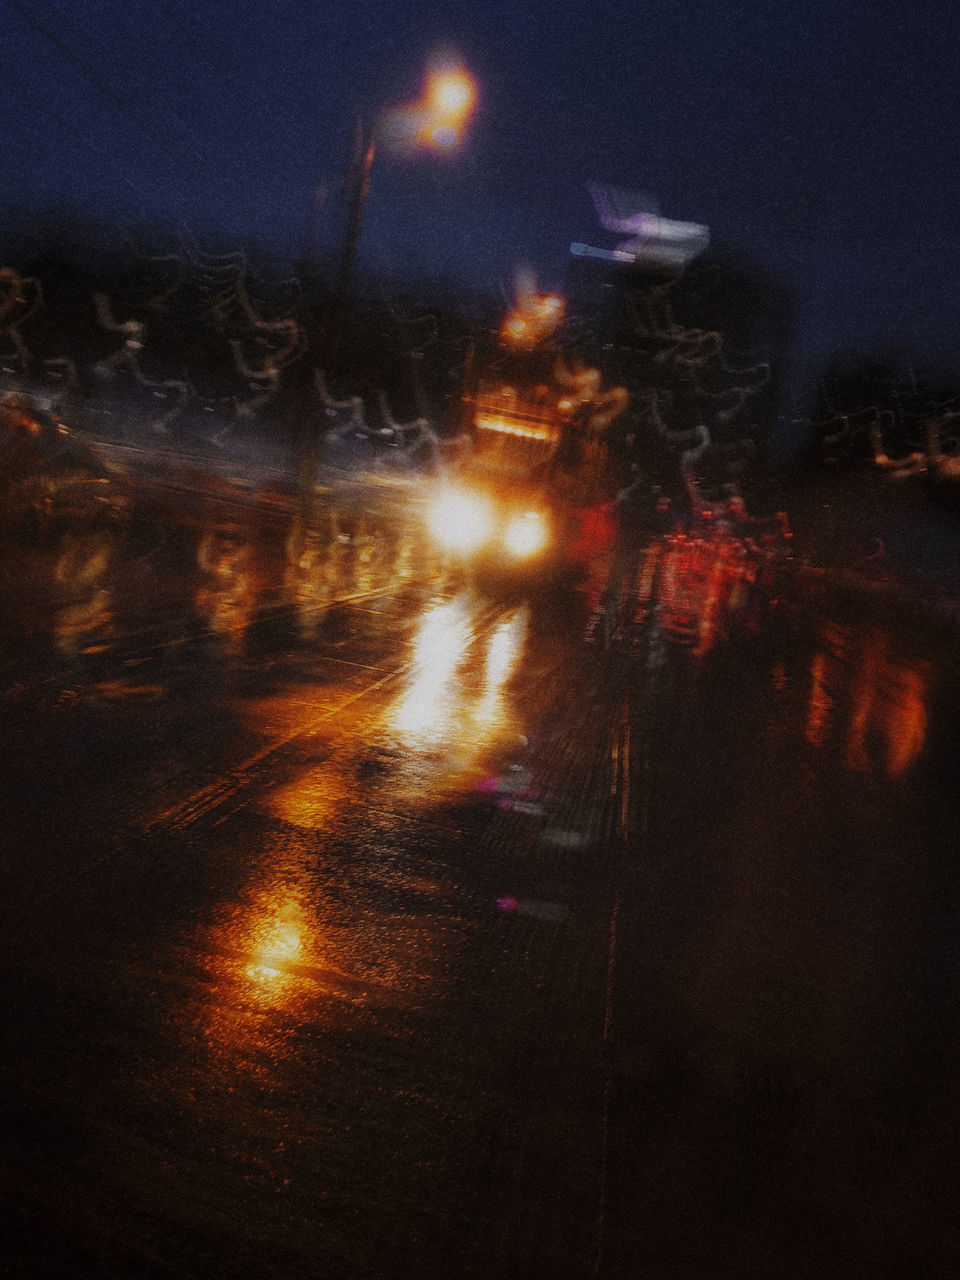 ILLUMINATED LIGHT TRAILS ON STREET DURING RAINY SEASON